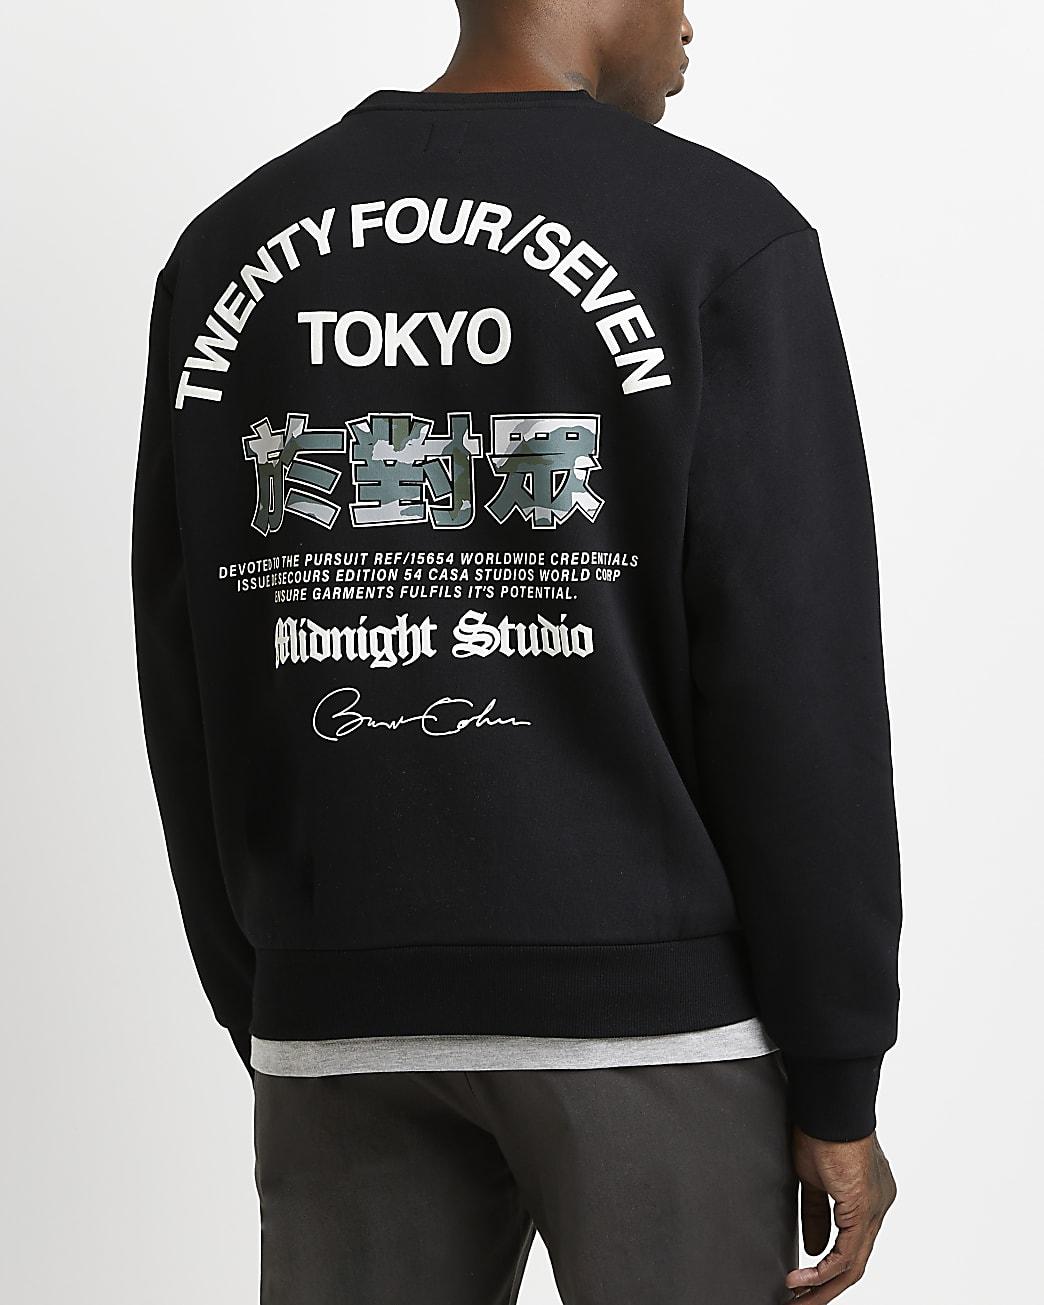 Black regular fit graphic sweatshirt